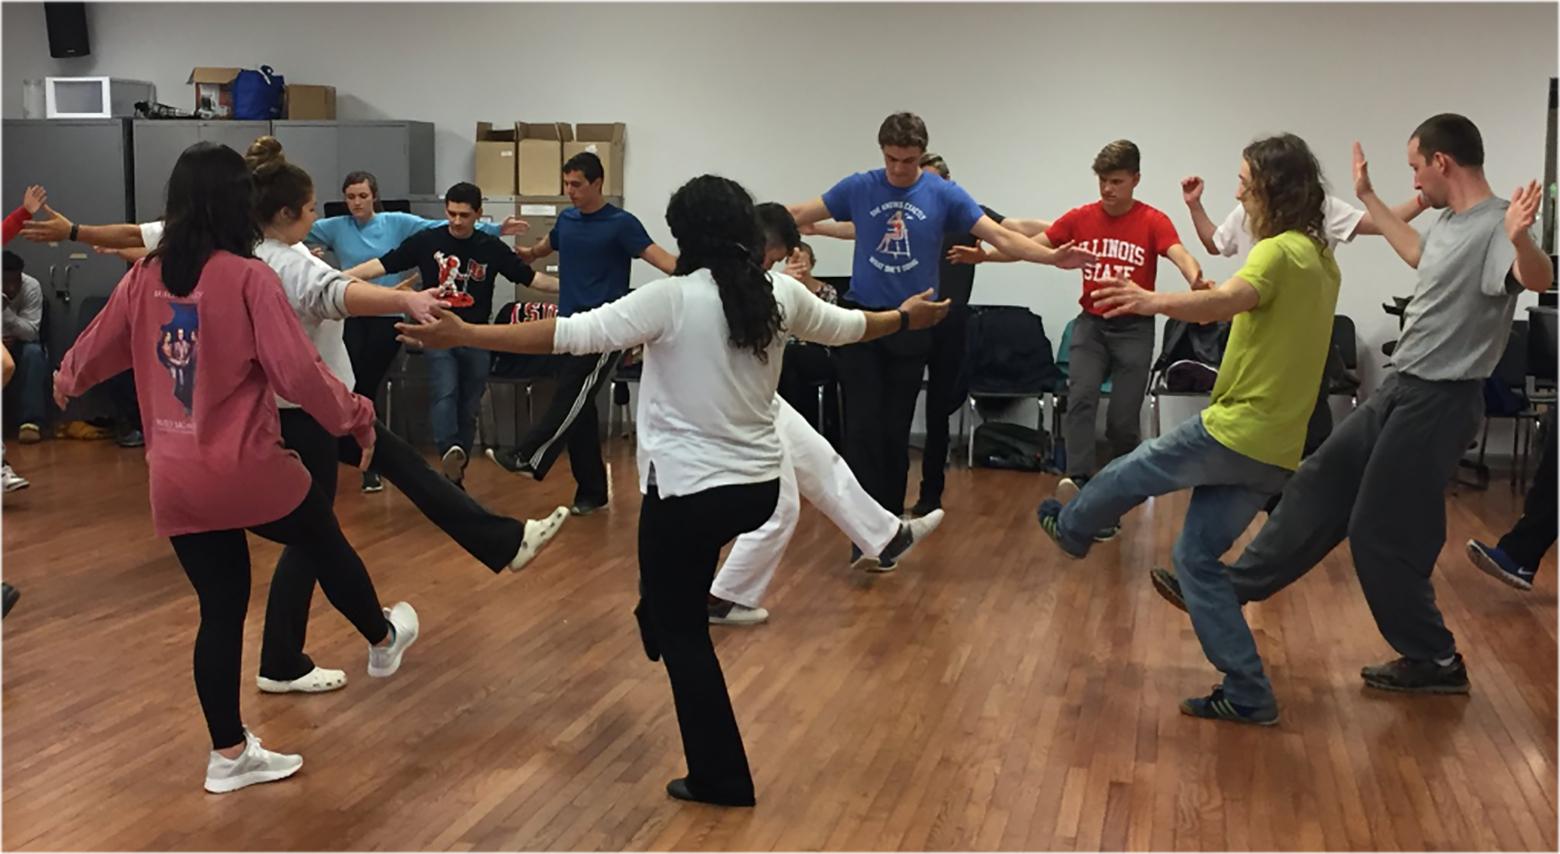 People performing Capoeira